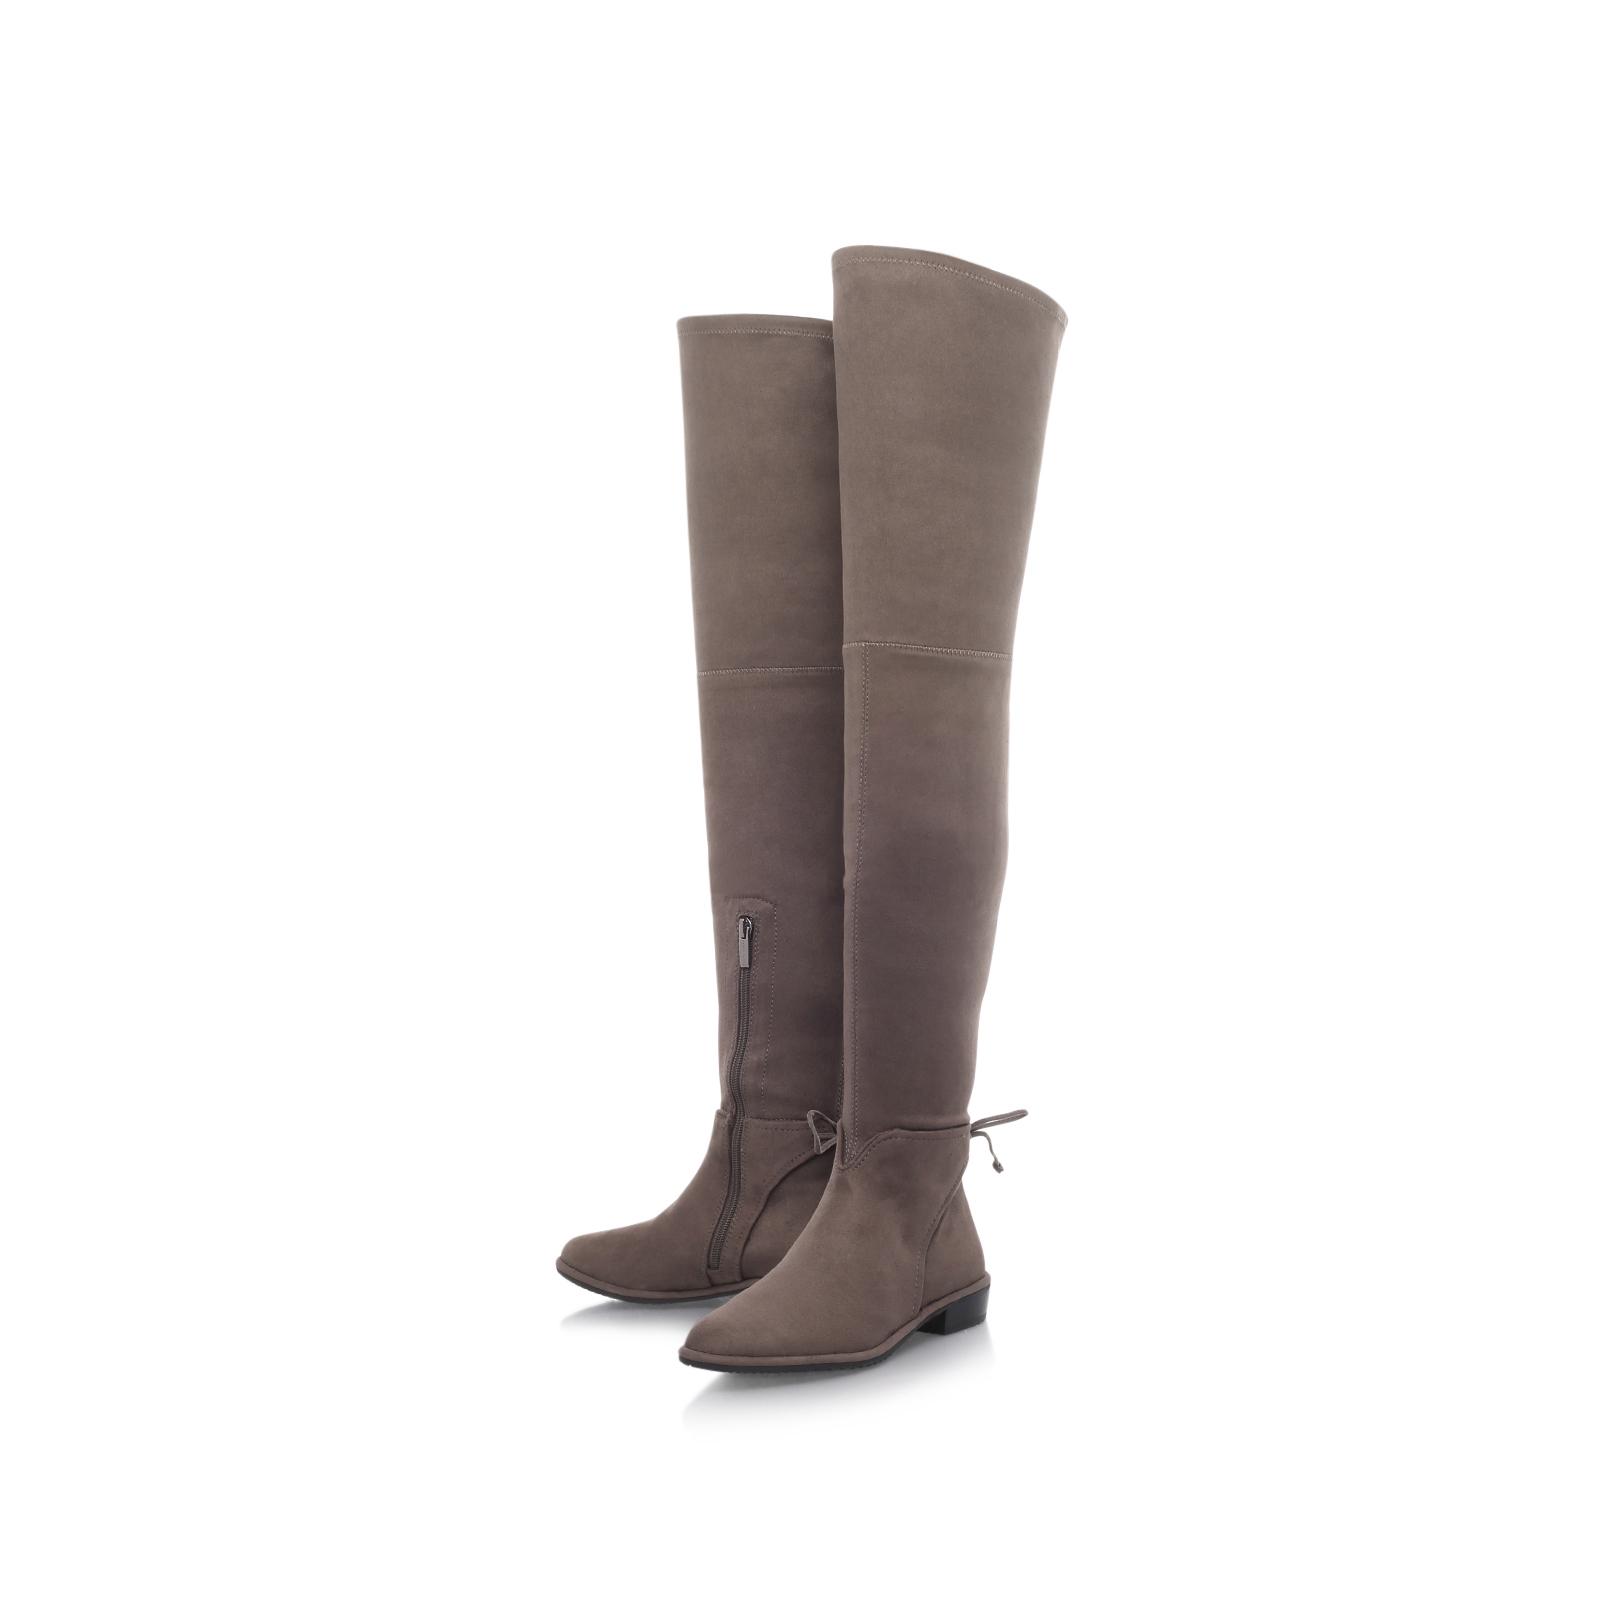 CADDEA Vince Camuto Caddea Mid Grey Low Heel High Leg Boots by VINCE CAMUTO